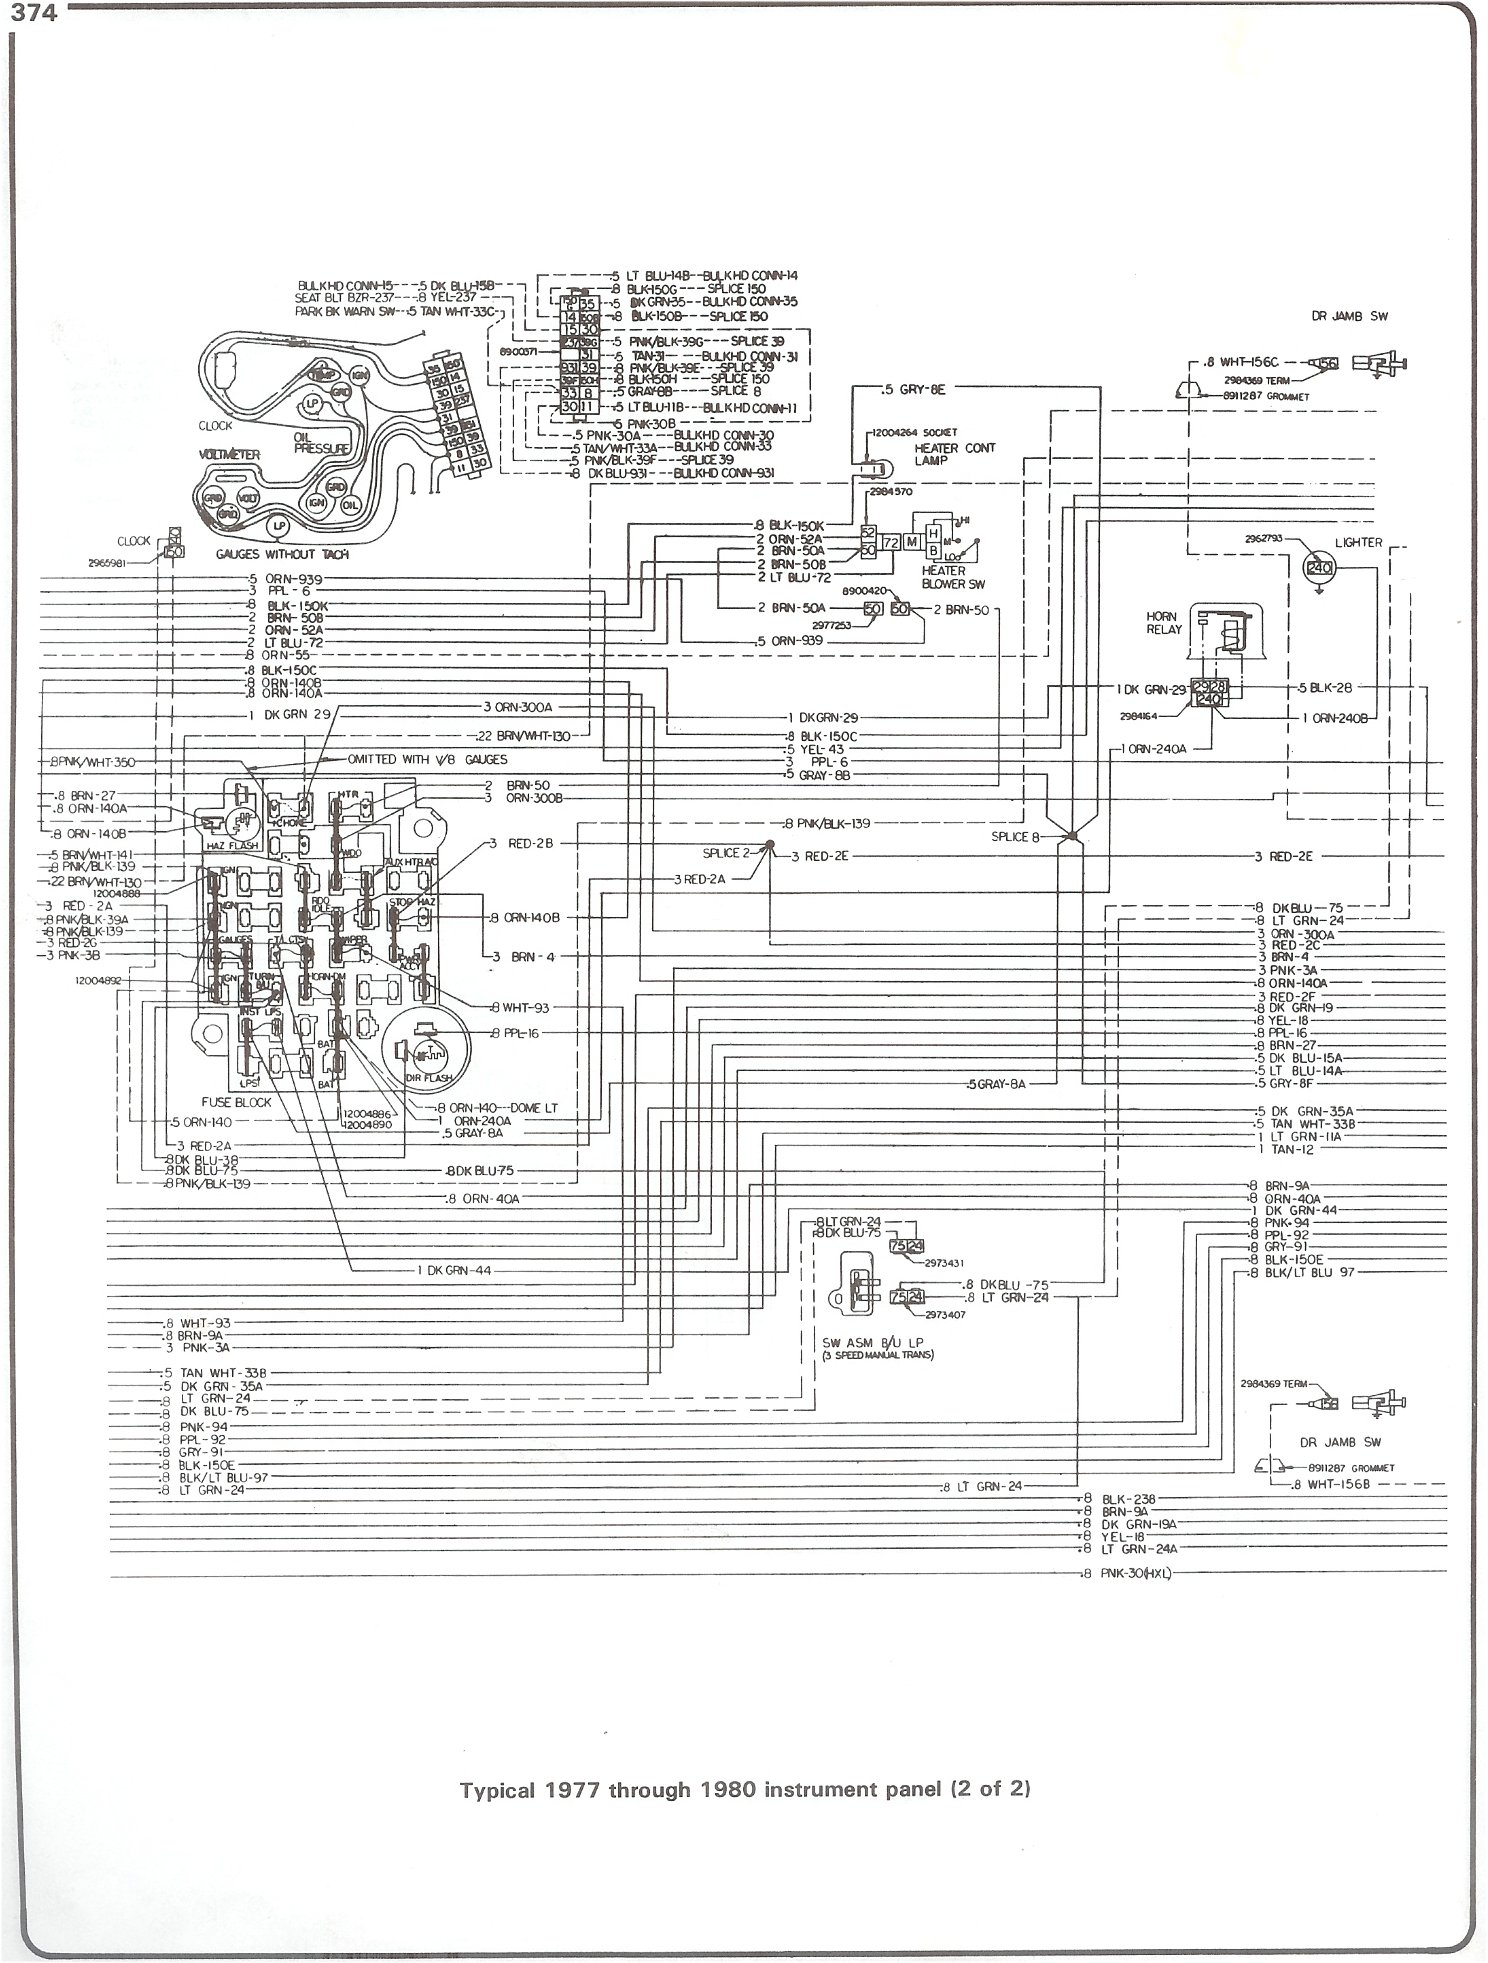 Stupendous Hyundai Santro Wiring Diagram Pdf Wiring Diagram Wiring Cloud Hisonuggs Outletorg